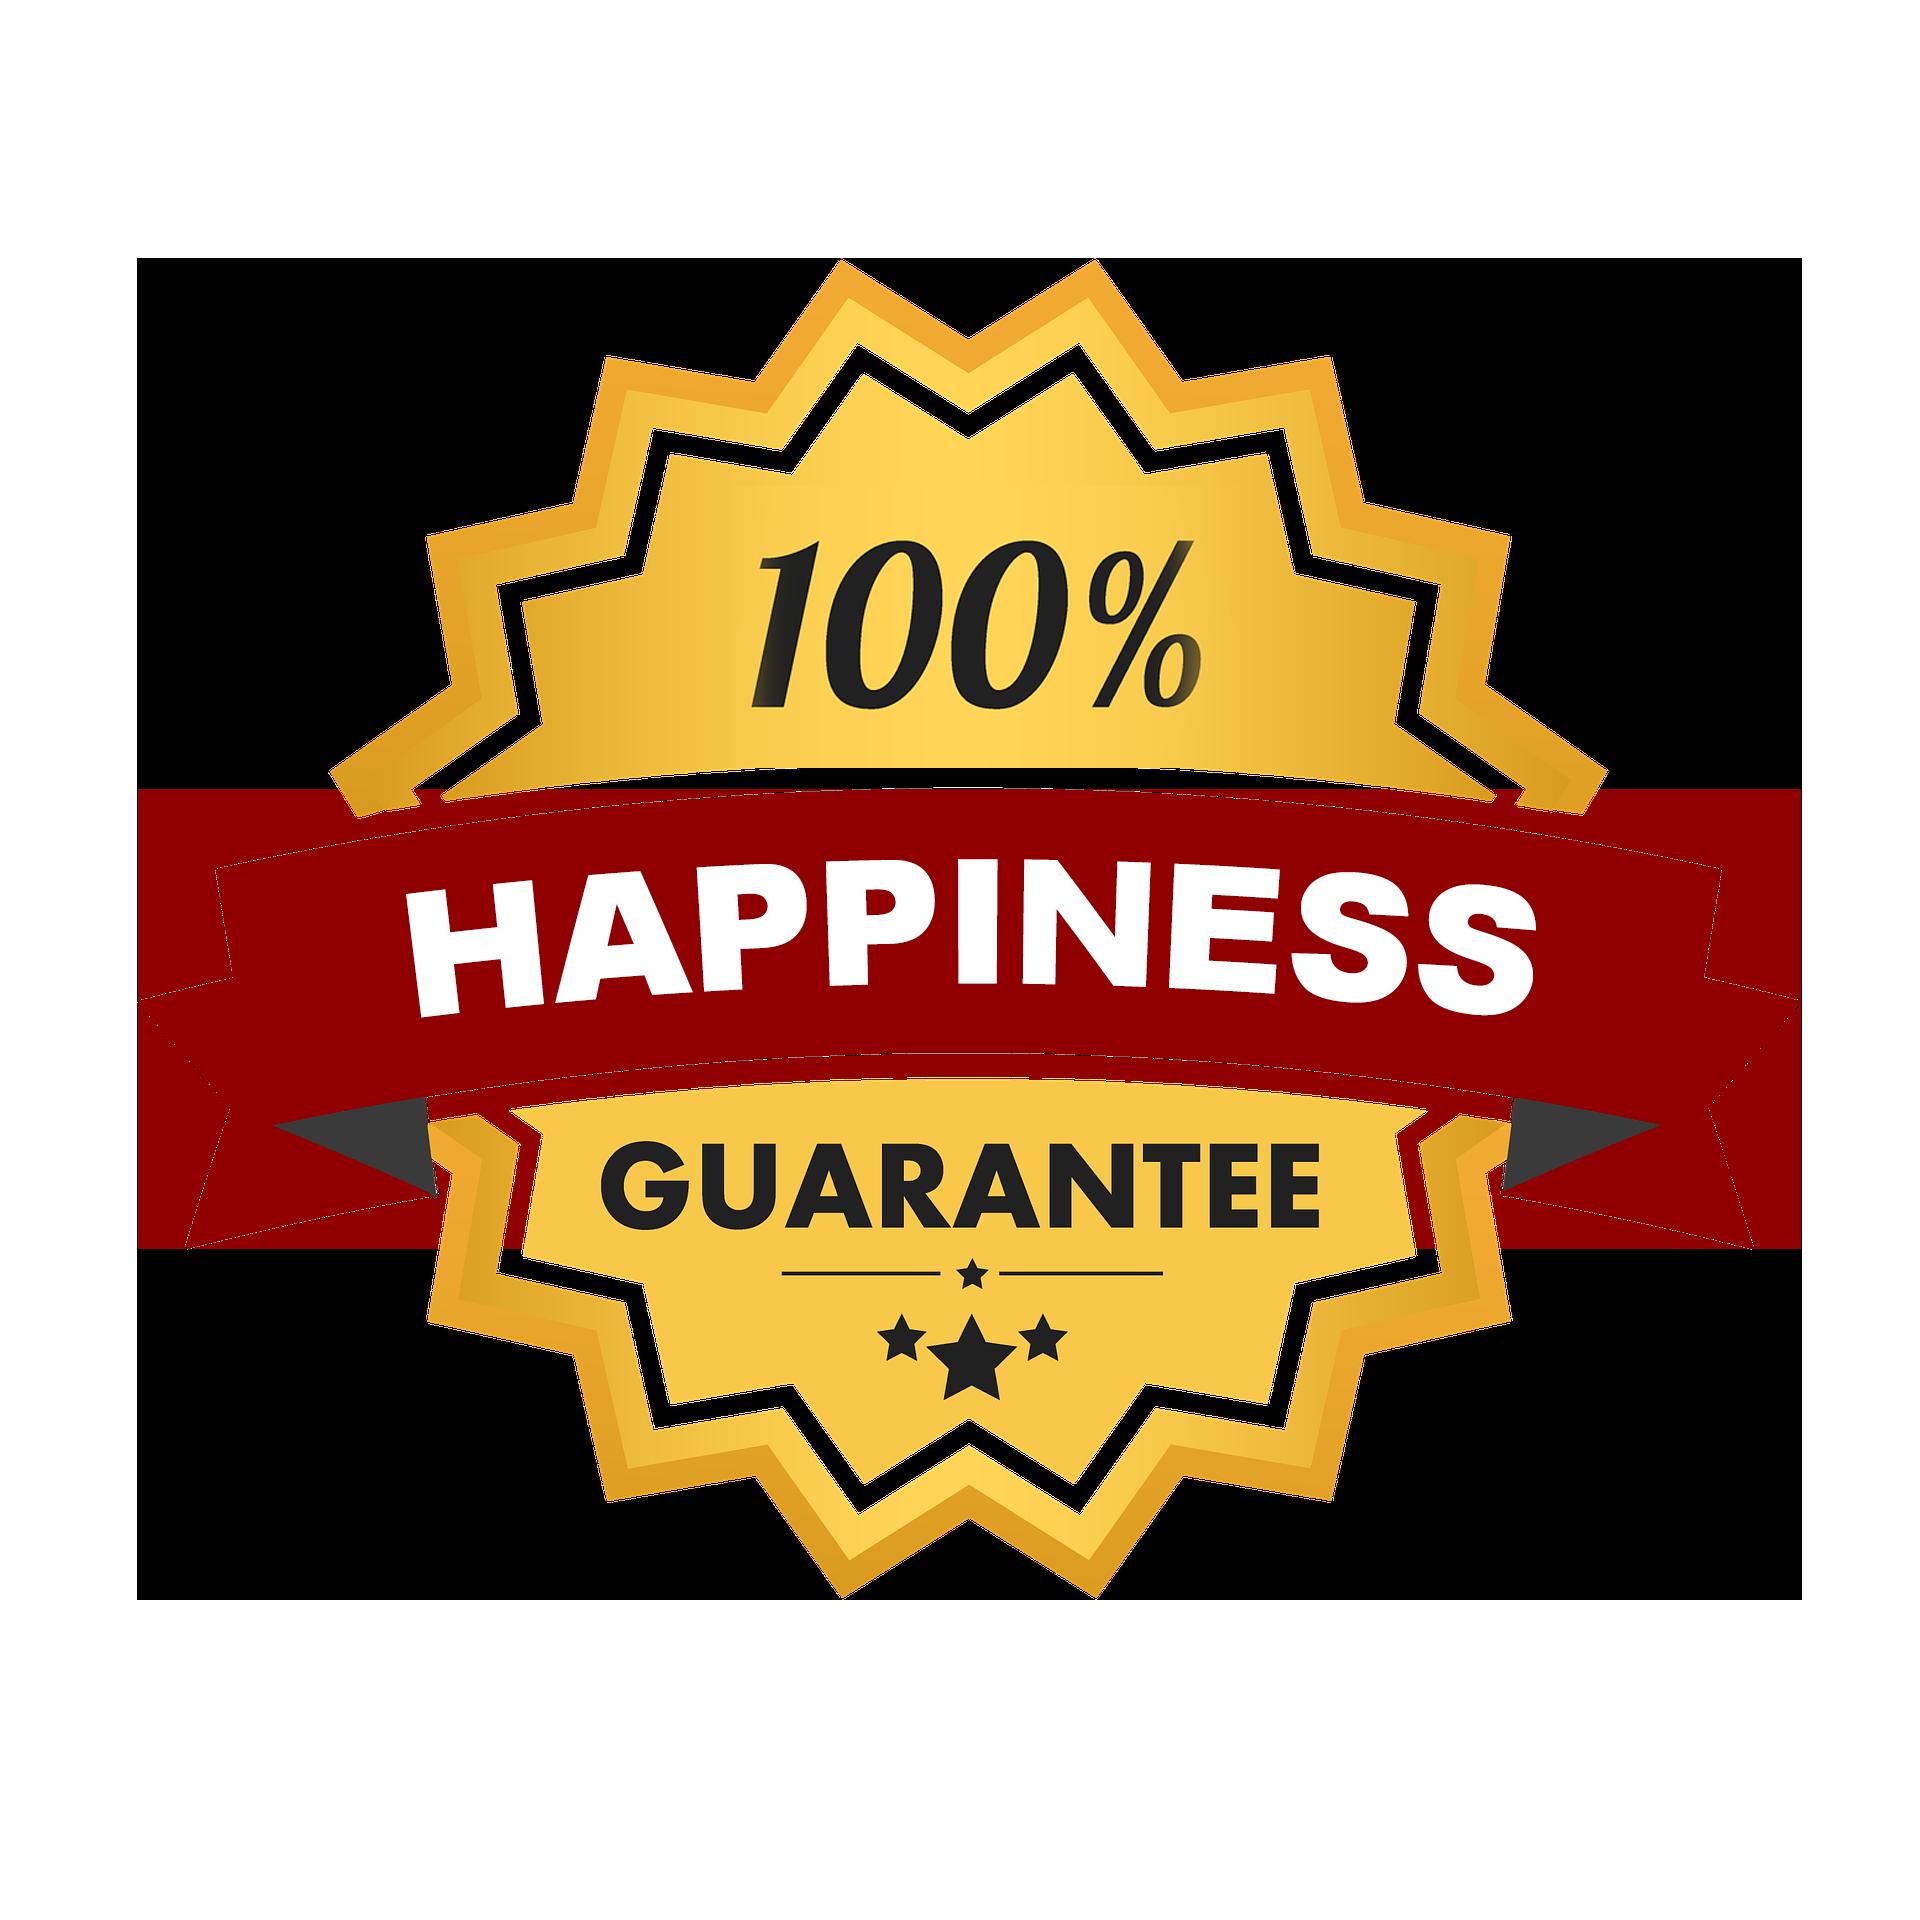 Happiness Guarantee